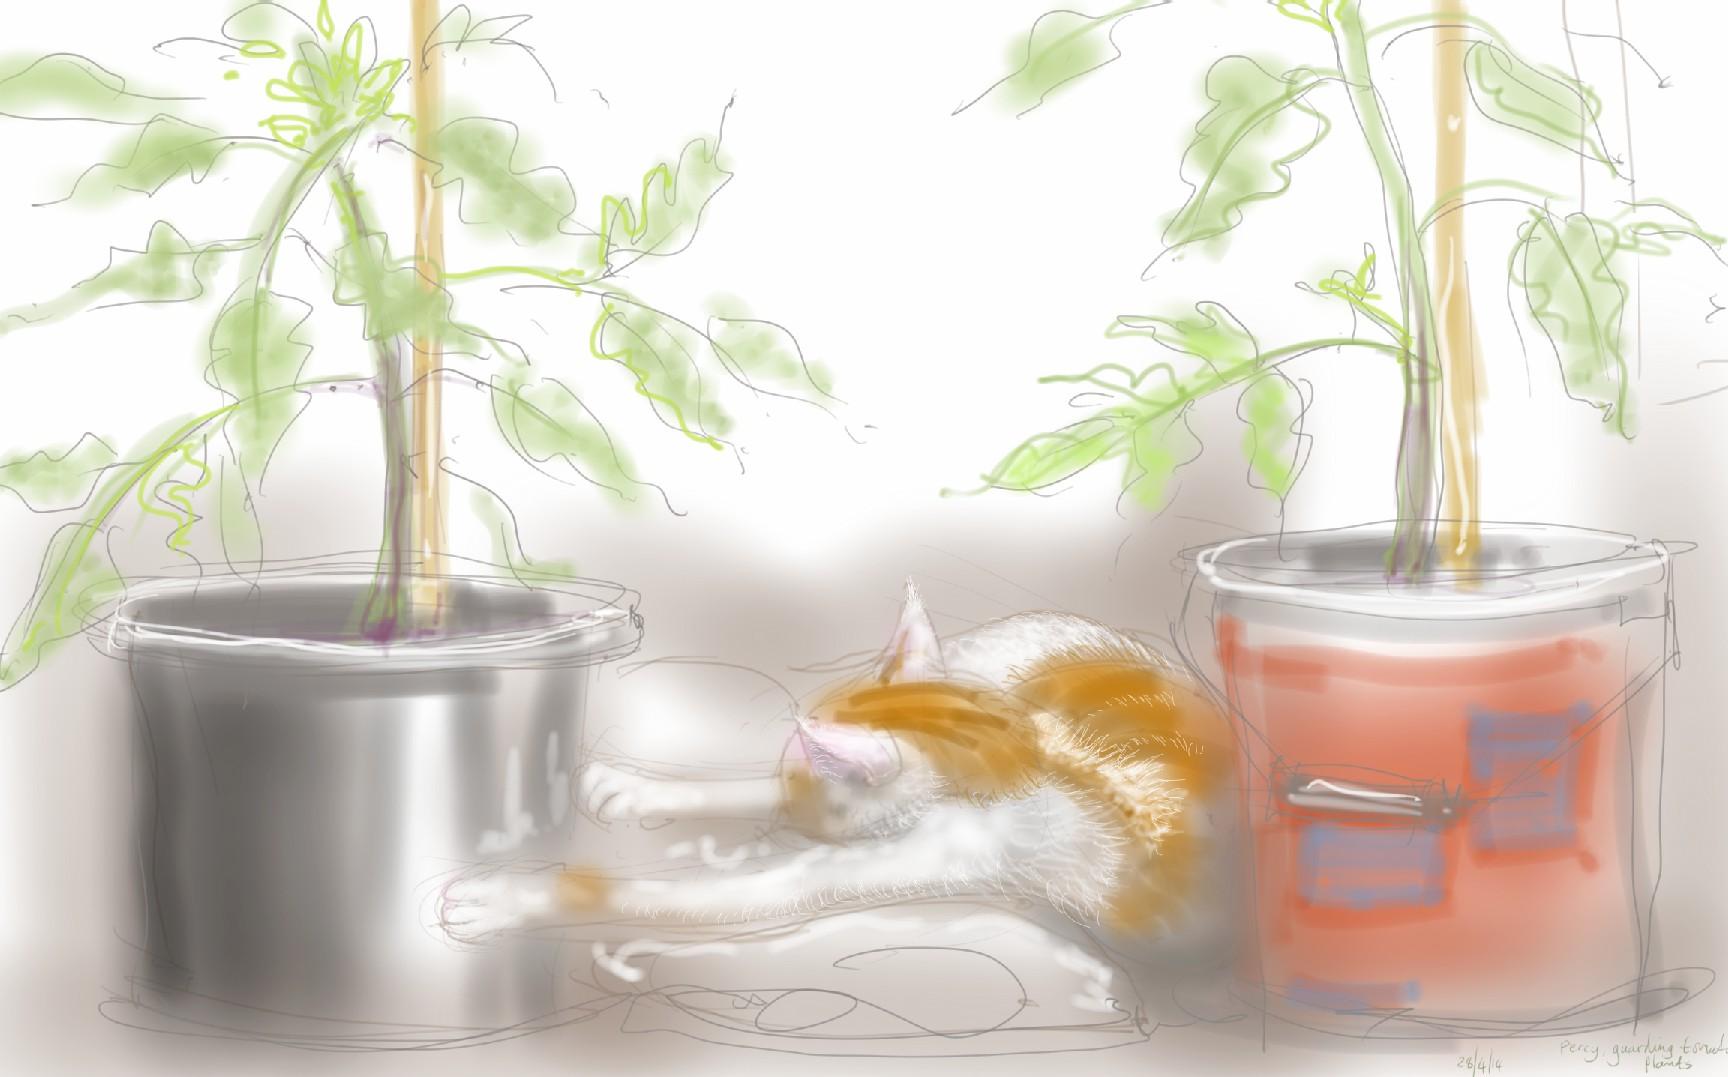 Percy Cat guarding tomato plants